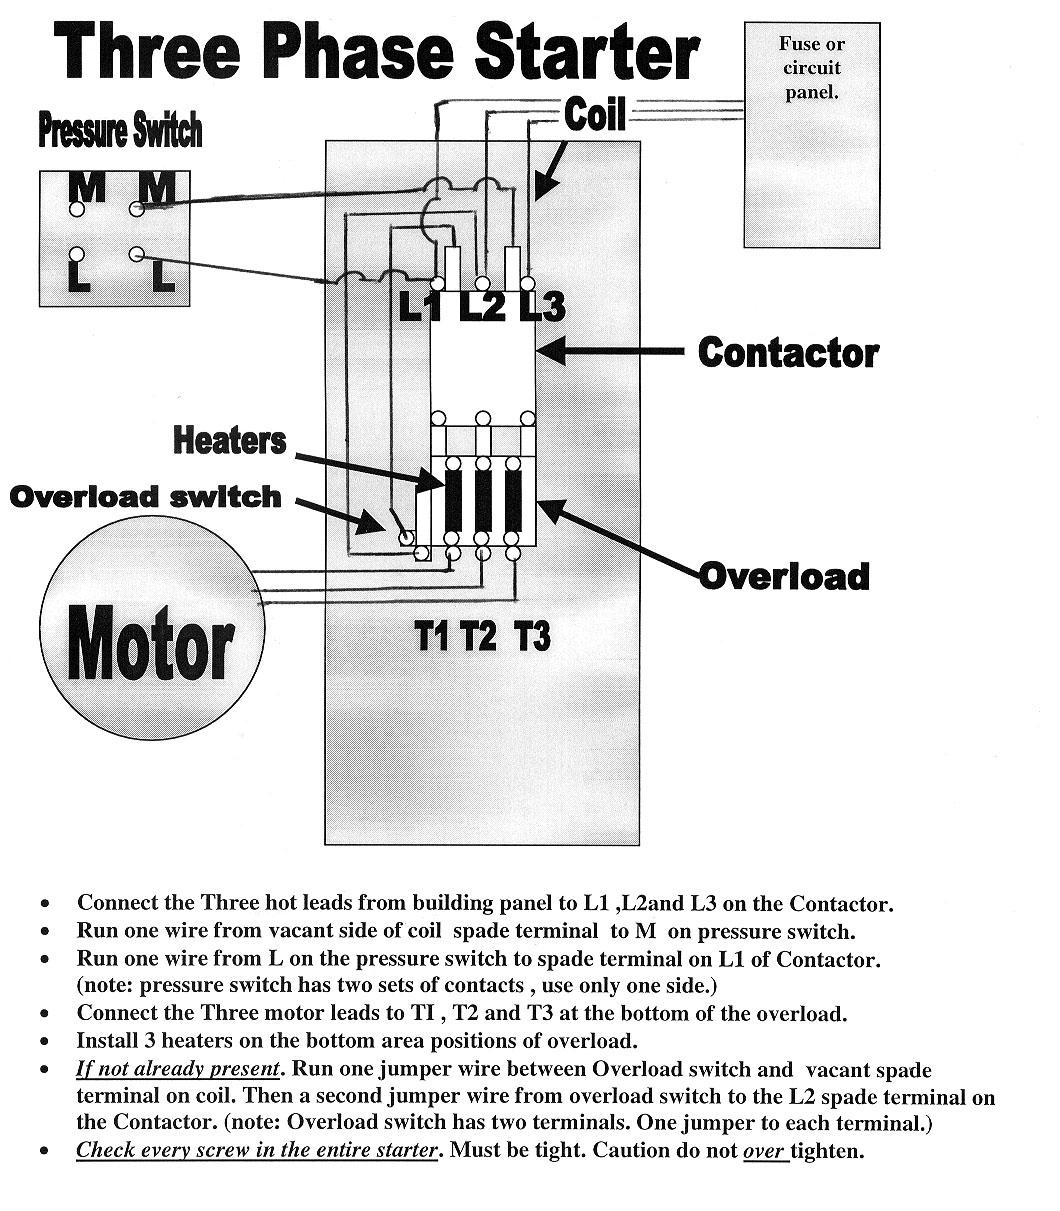 Single Phase Magnetic Starter Wiring Diagram | Manual E-Books - Magnetic Starter Wiring Diagram